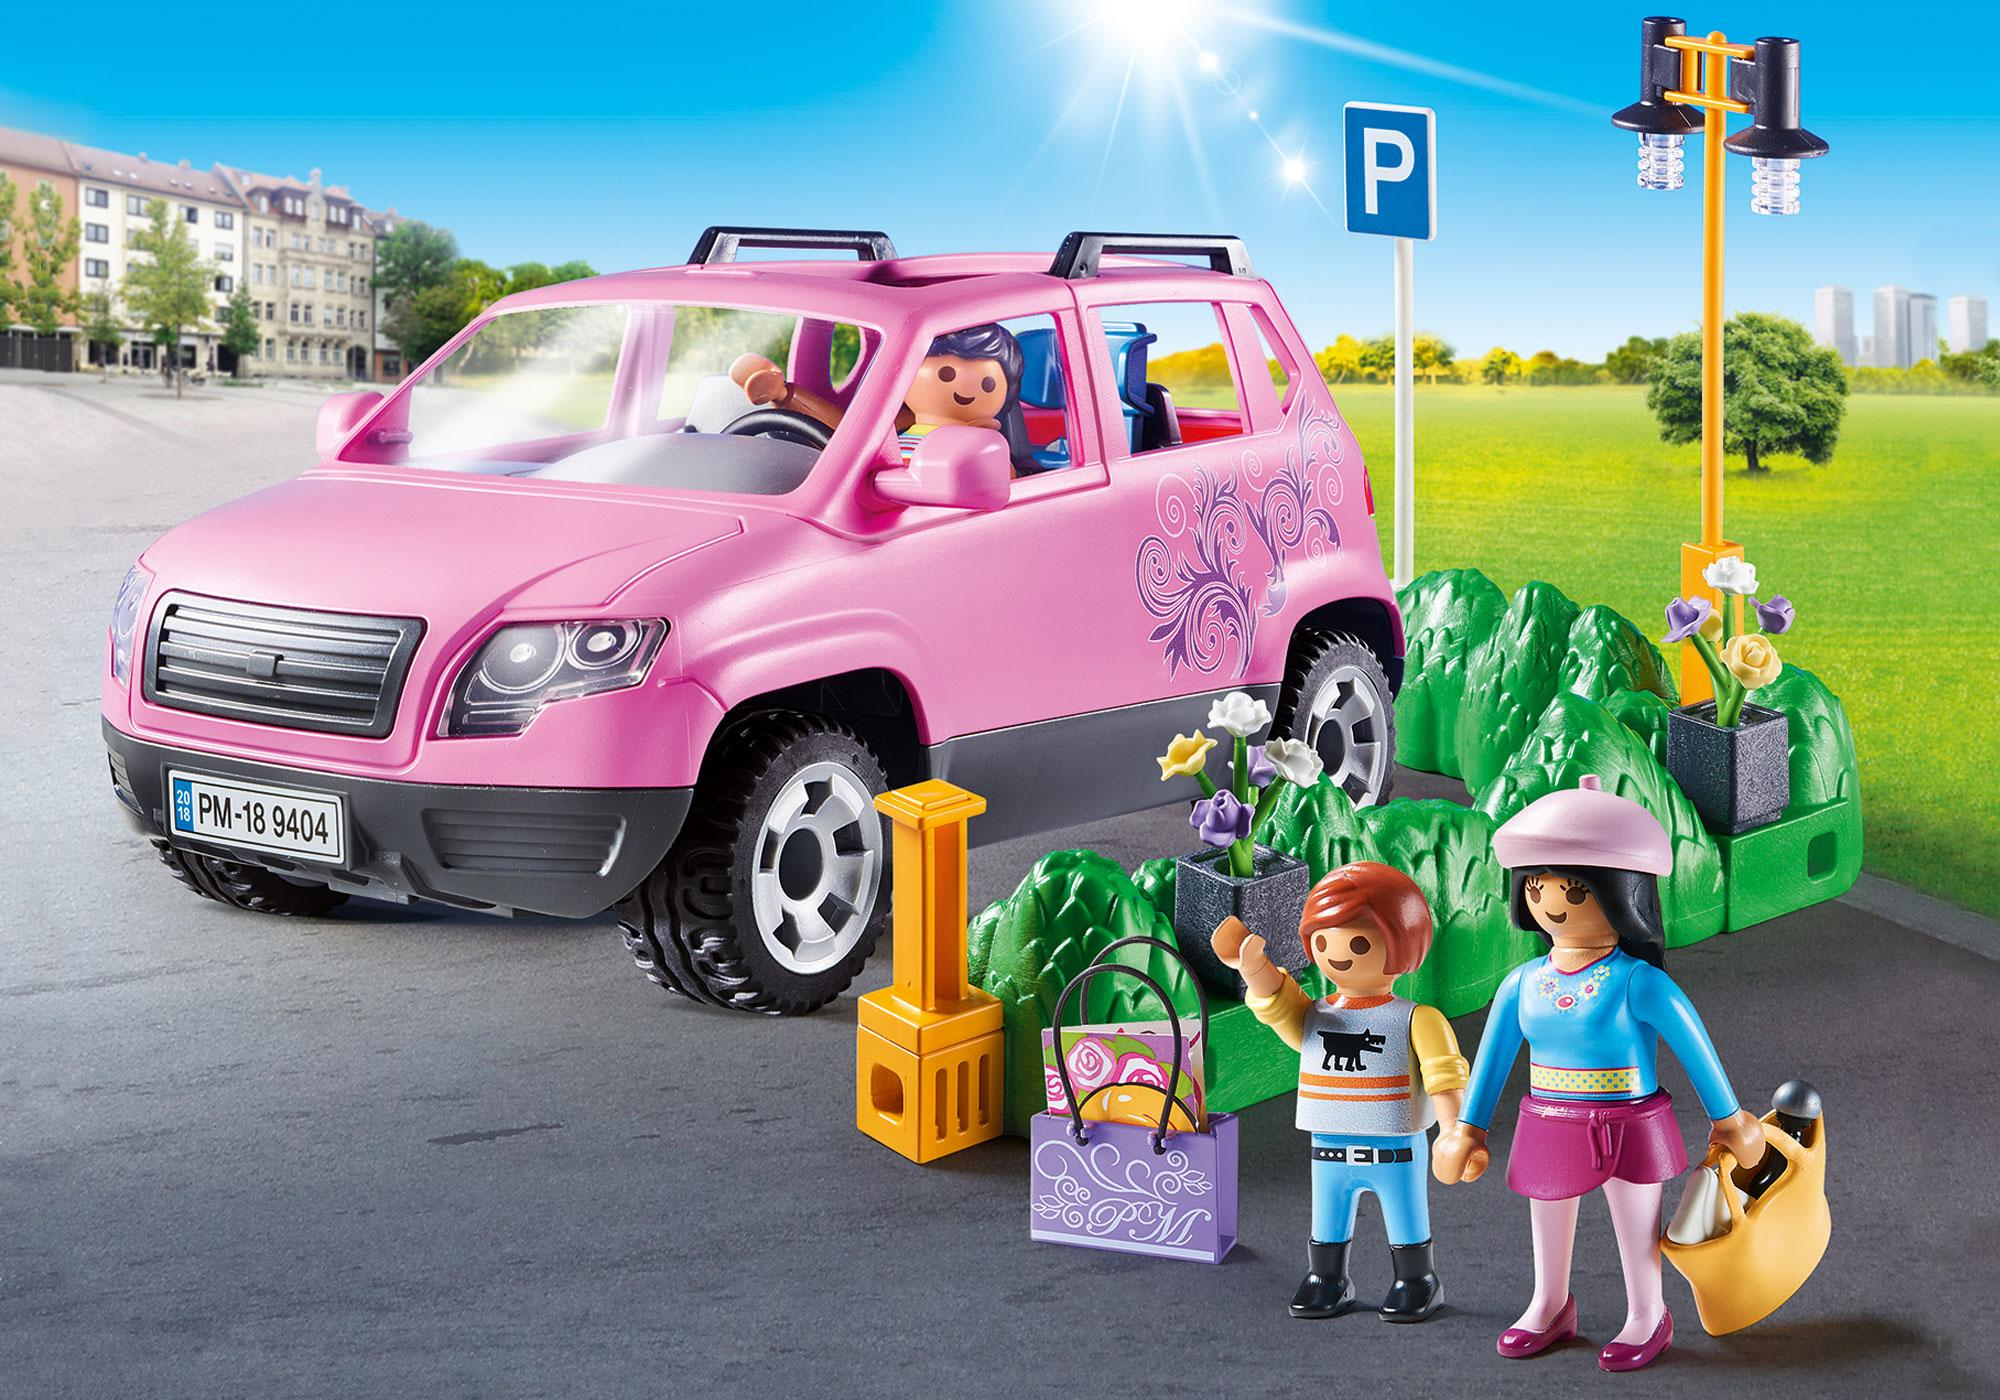 http://media.playmobil.com/i/playmobil/9404_product_detail/Famiglia al parcheggio dell'outlet